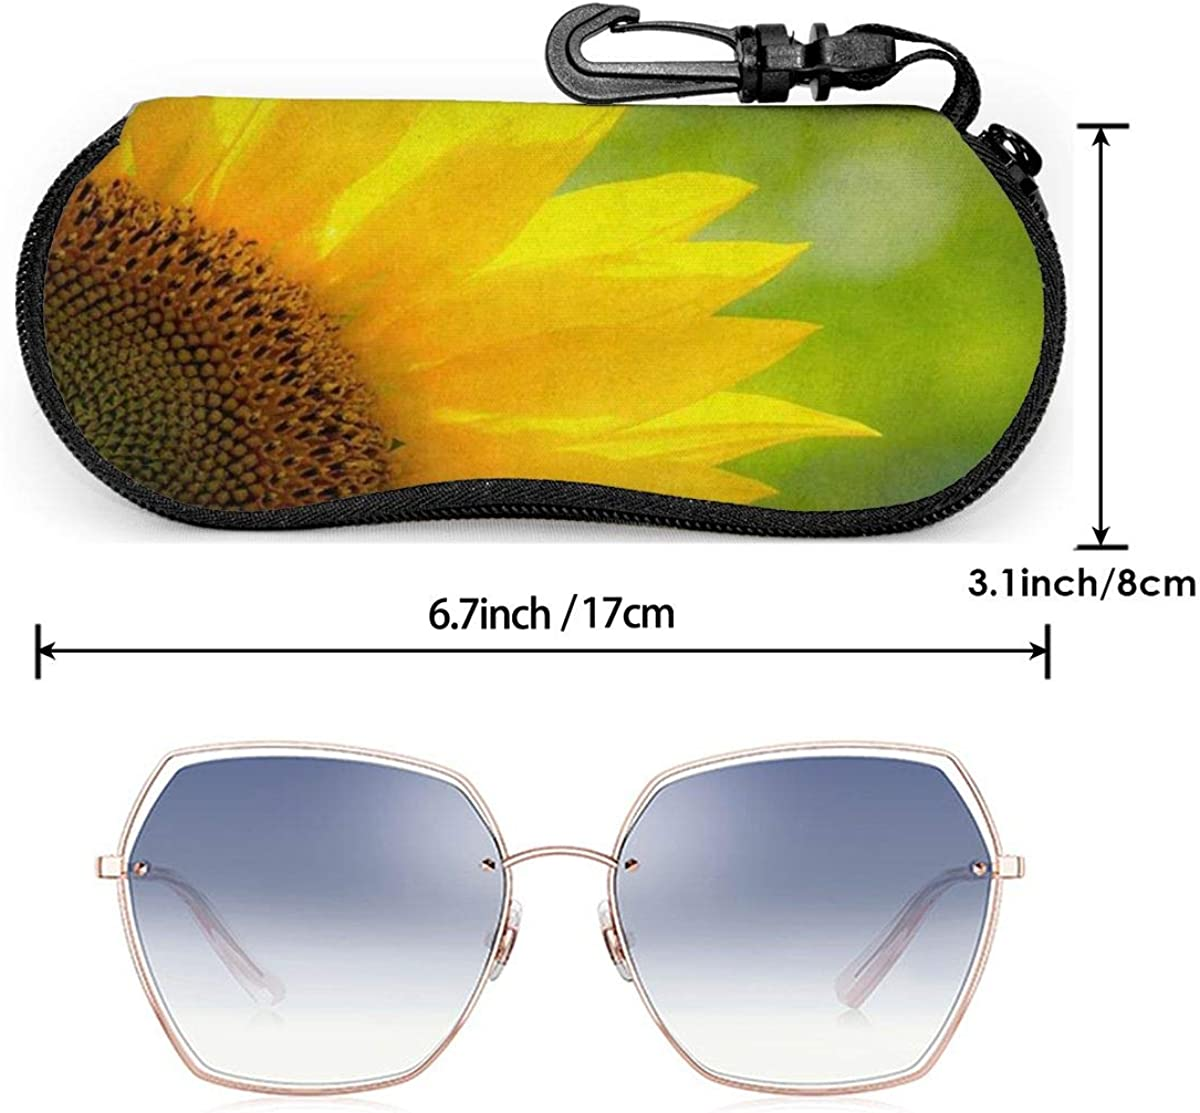 Close-Up Of Beautiful Sunflower In A Field Sunglasses Soft Case Ultra Light Neoprene Zipper Eyeglass Case With Key Chain